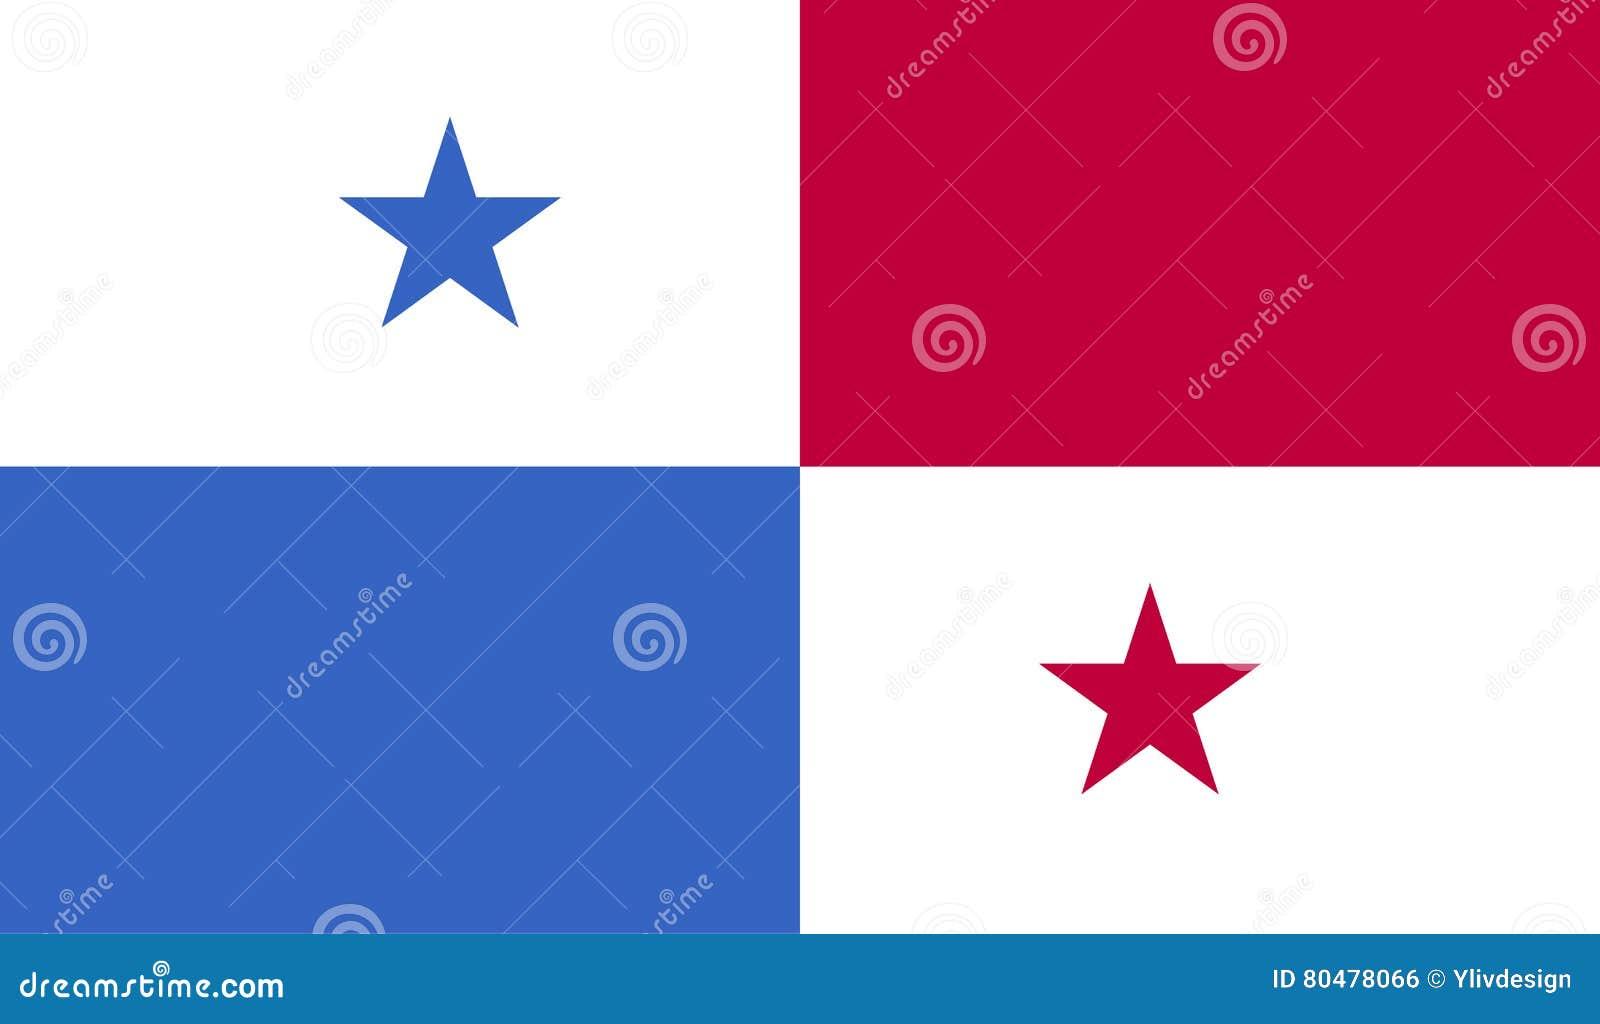 Panama flag image